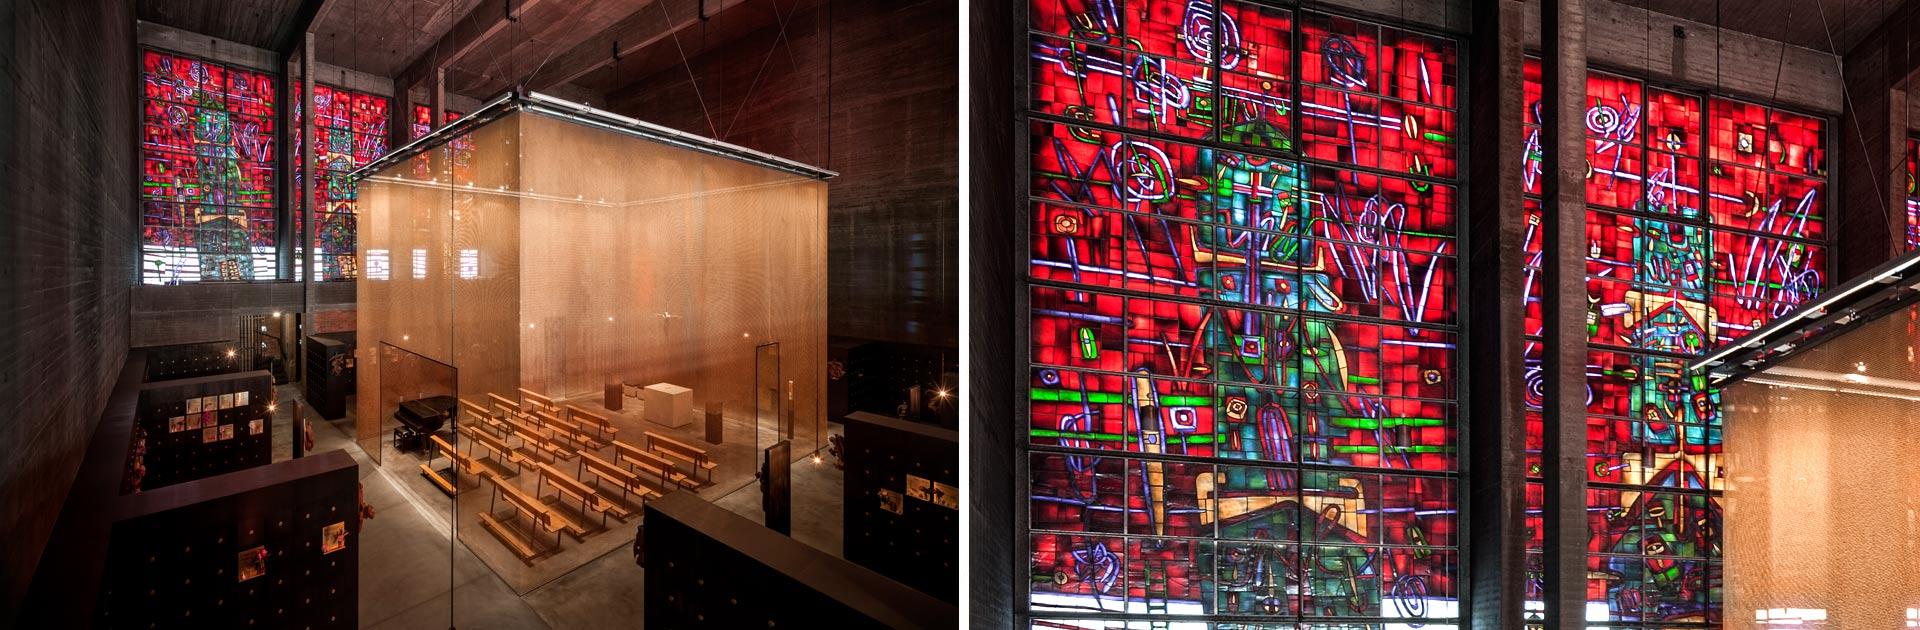 Grabeskirche St. Bartholomäus Köln, Glasfenster und Kapellenraum